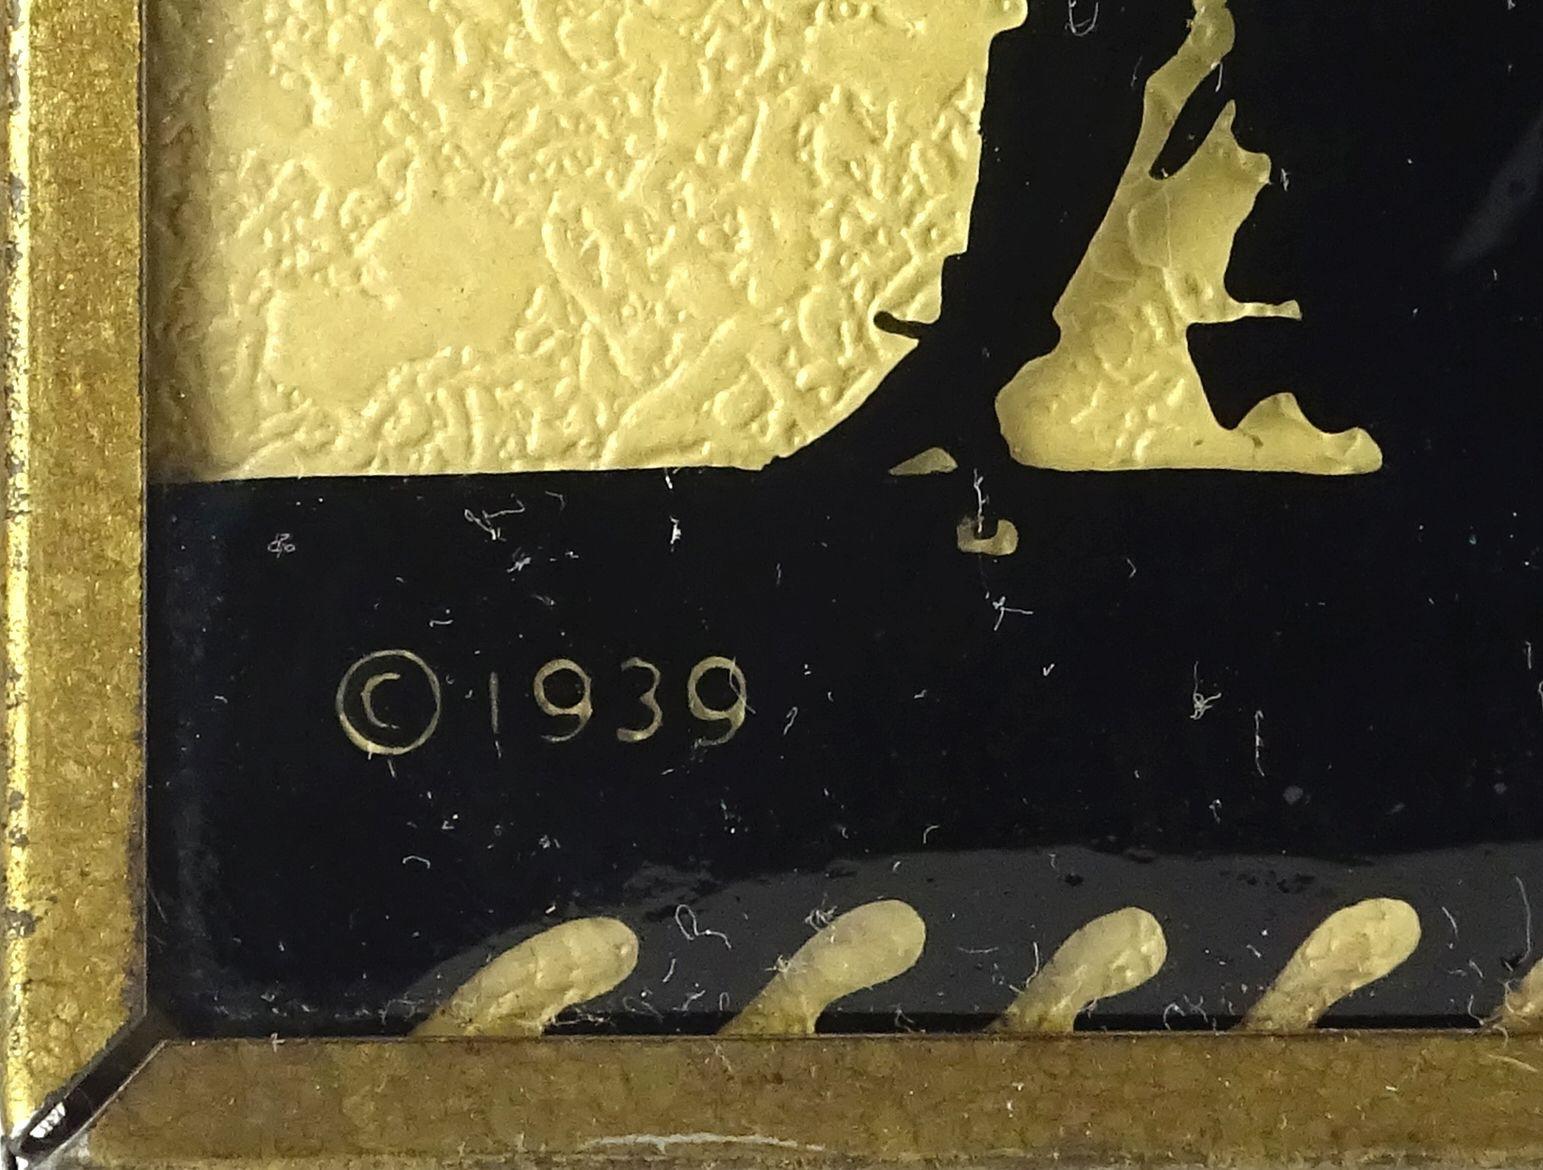 DSC06661.JPG (1543×1170)